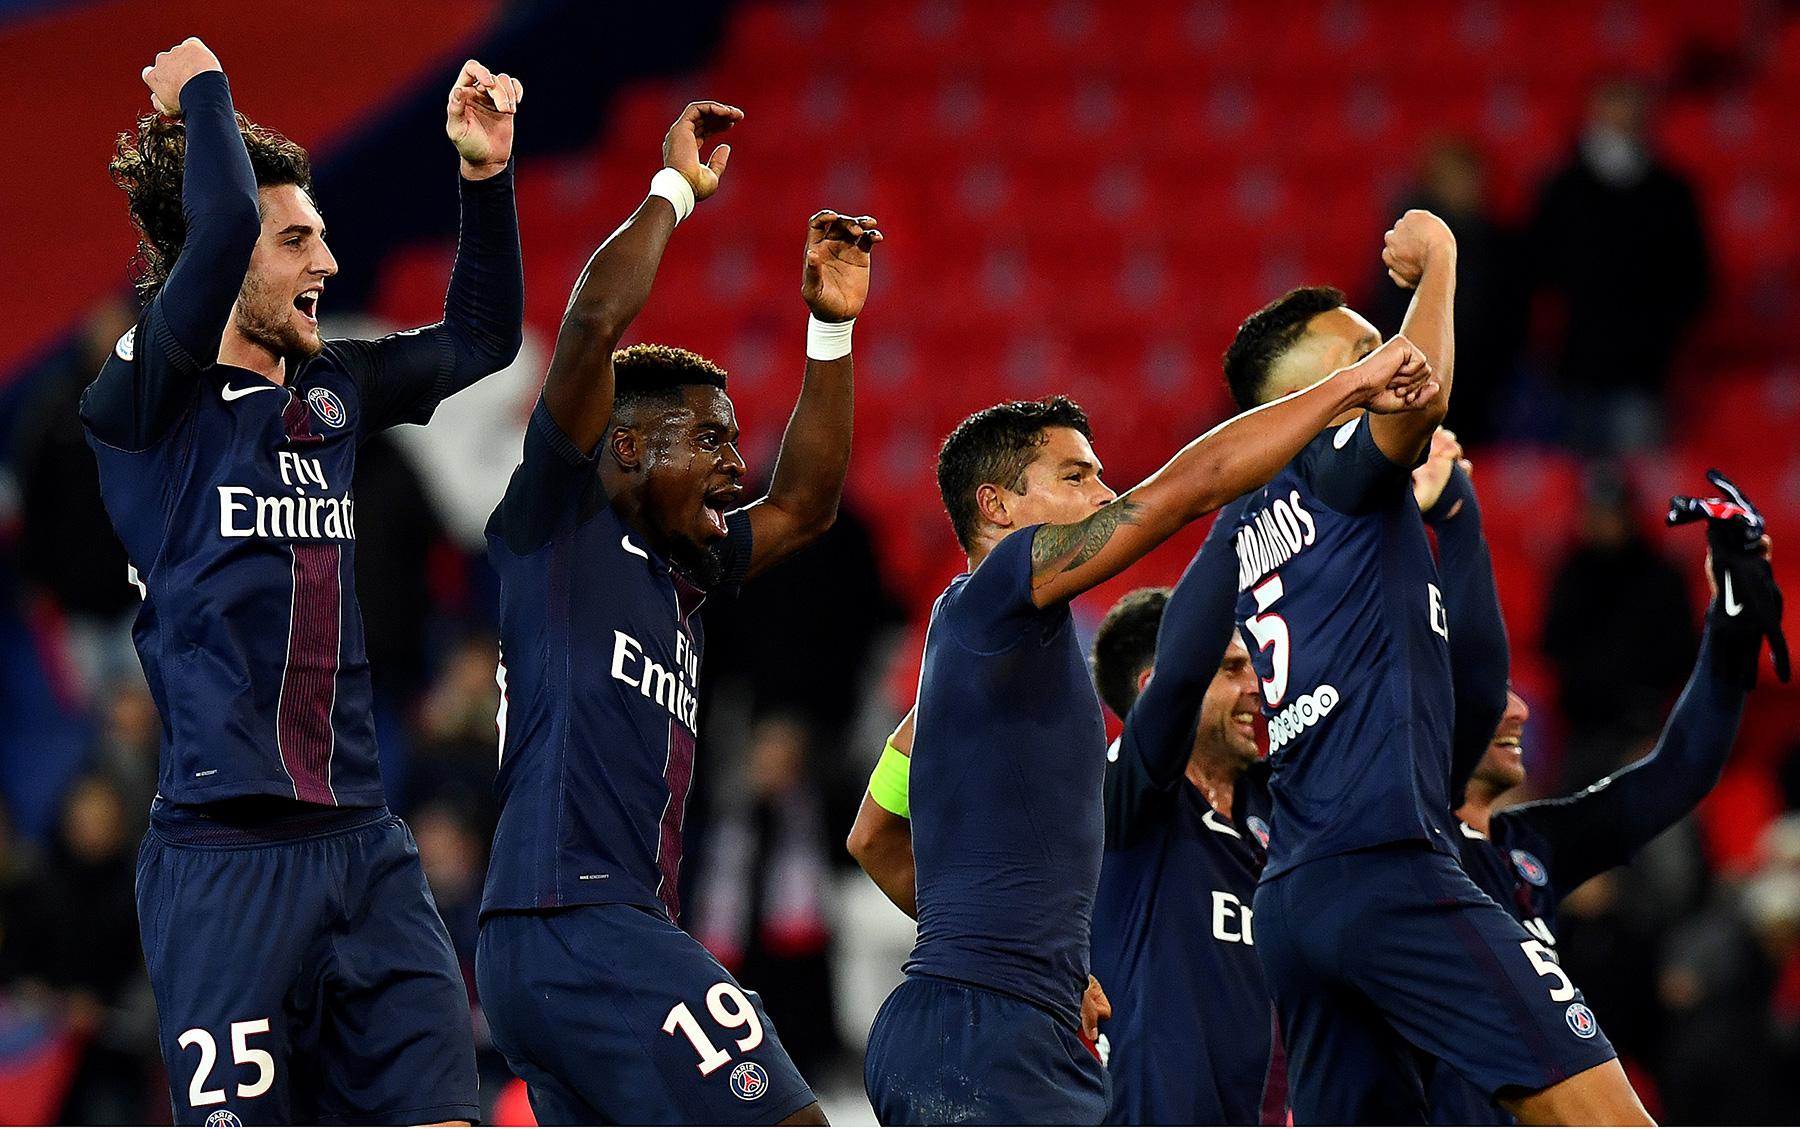 Image Result For Rennes Vs Psg